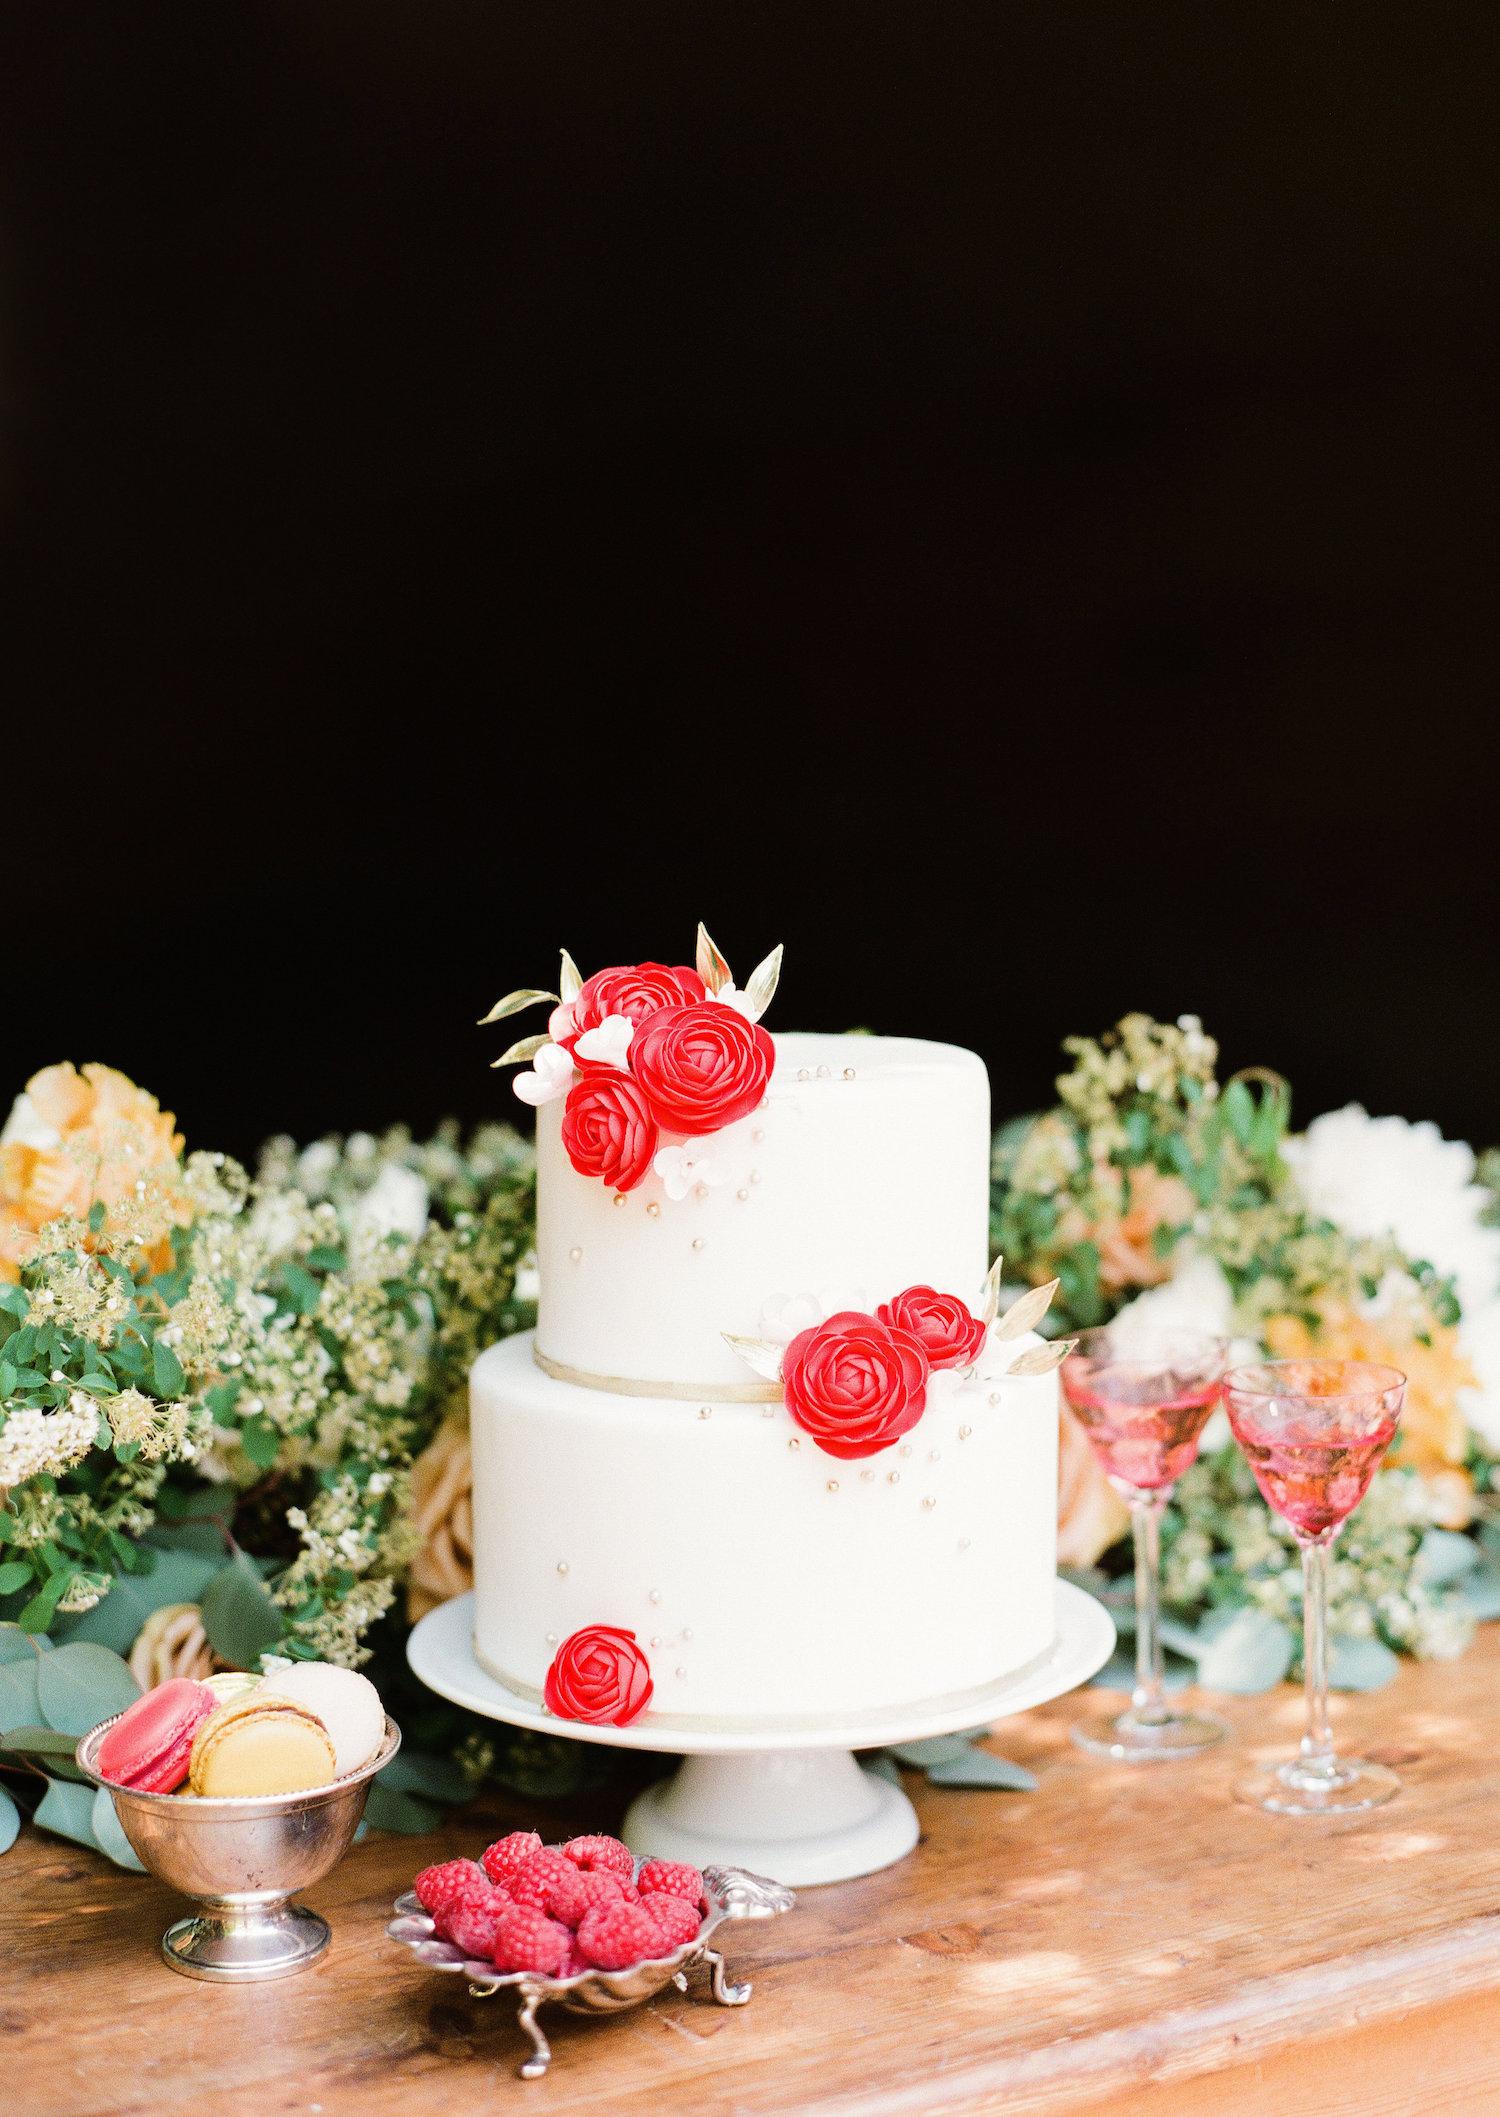 Morning Glow - Full Aperture Floral & Lindsay Madden Photography 107.jpeg